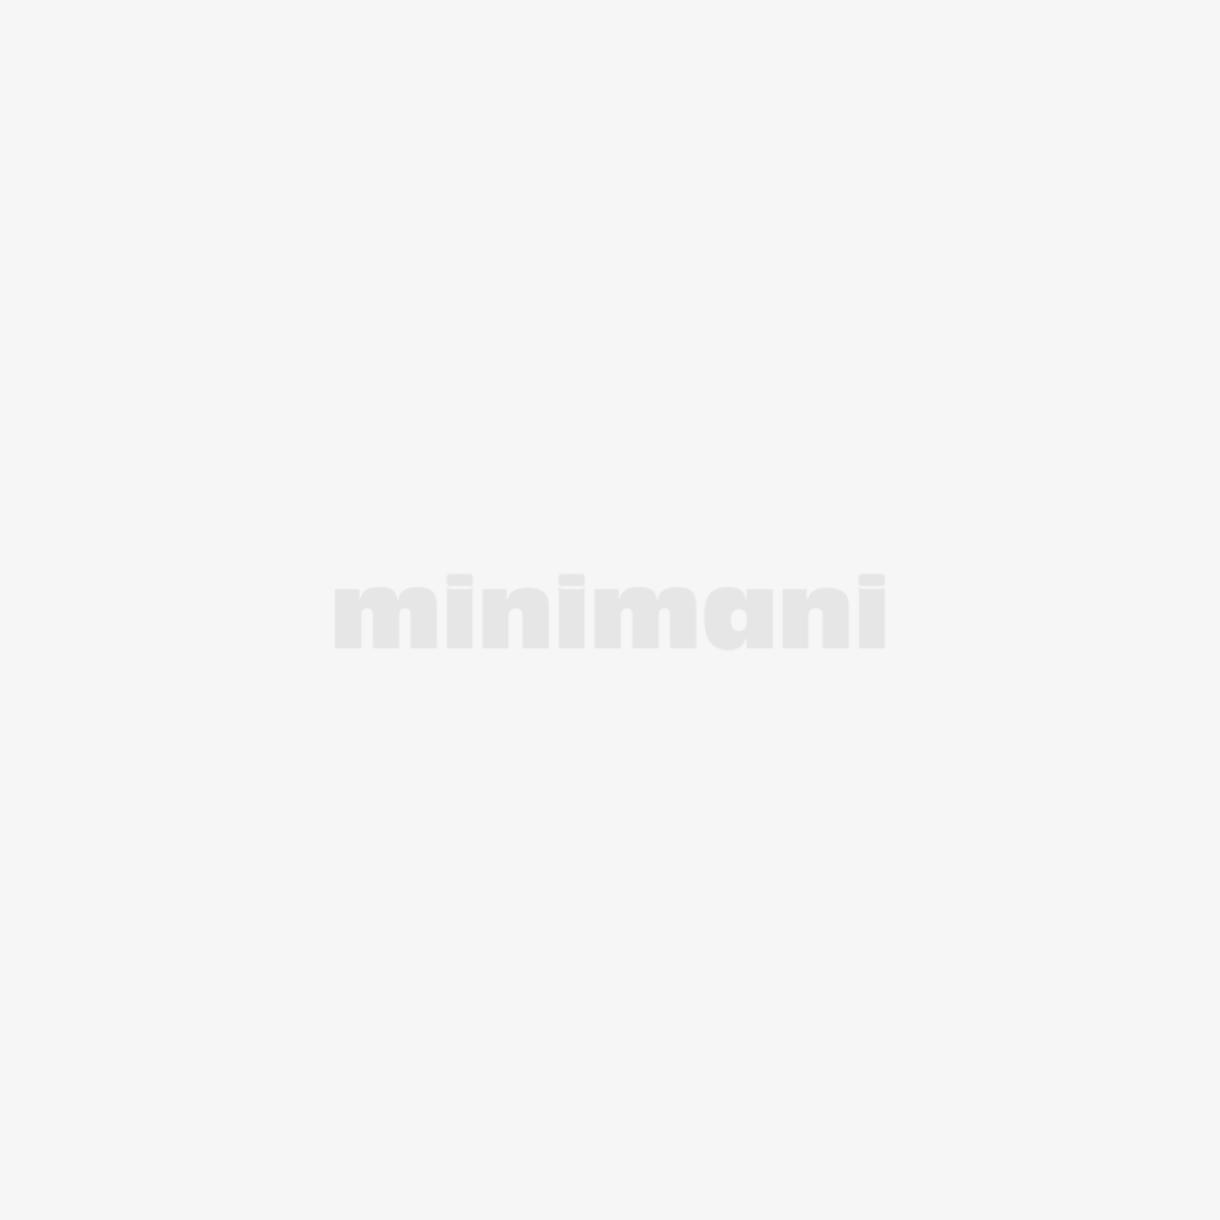 EINHELL POWER X-CHANGE STARTTIPAKKAUS 18V 30MIN LATURI SEK